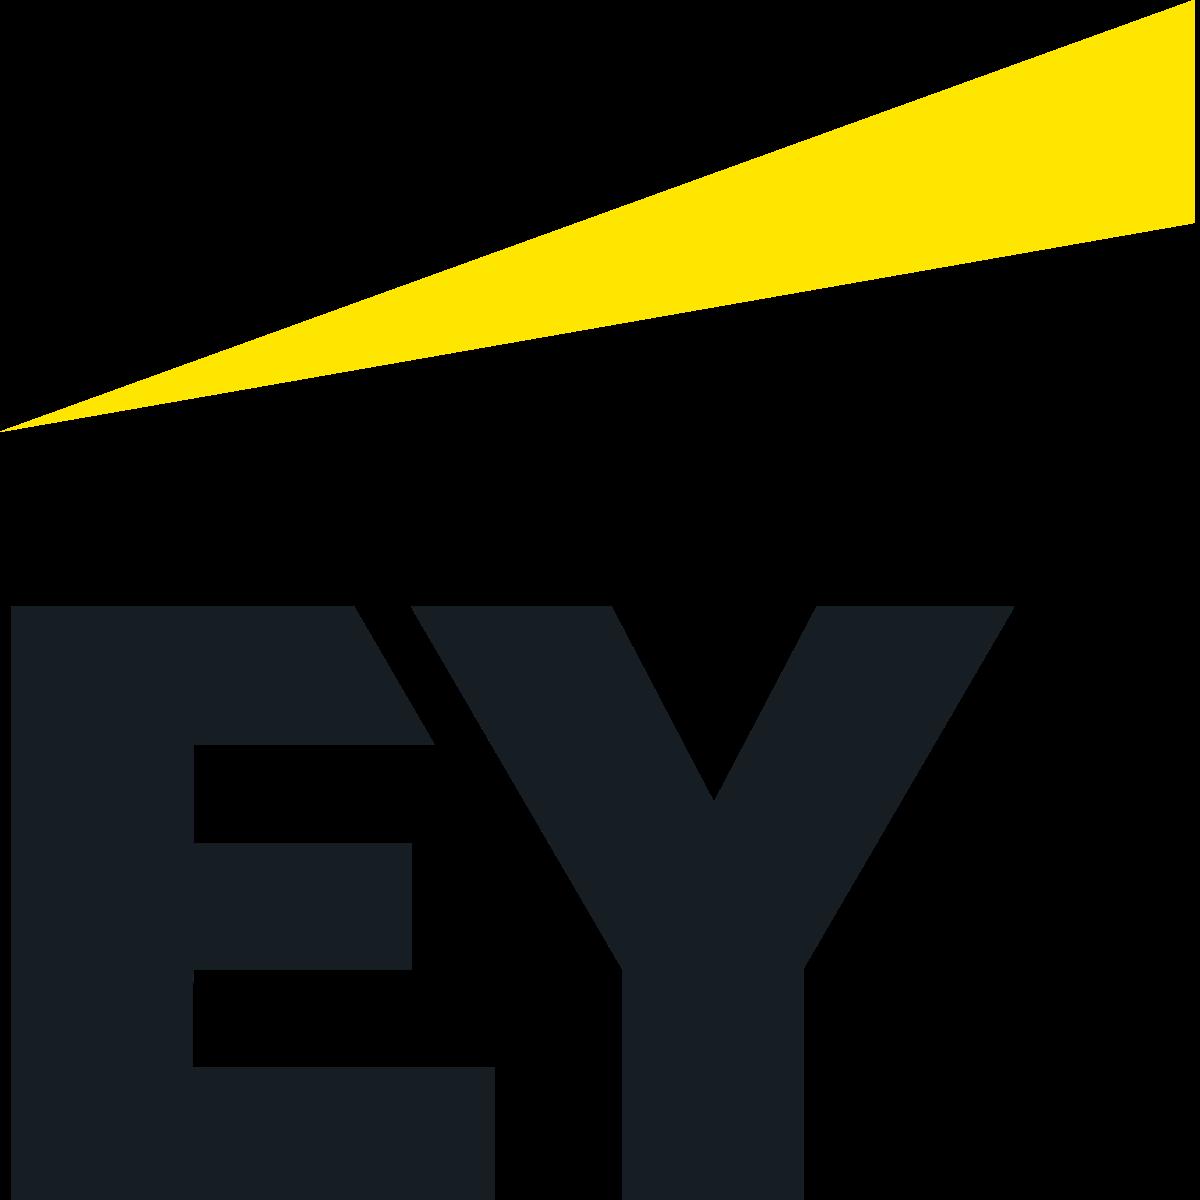 1200px-EY_logo_2019